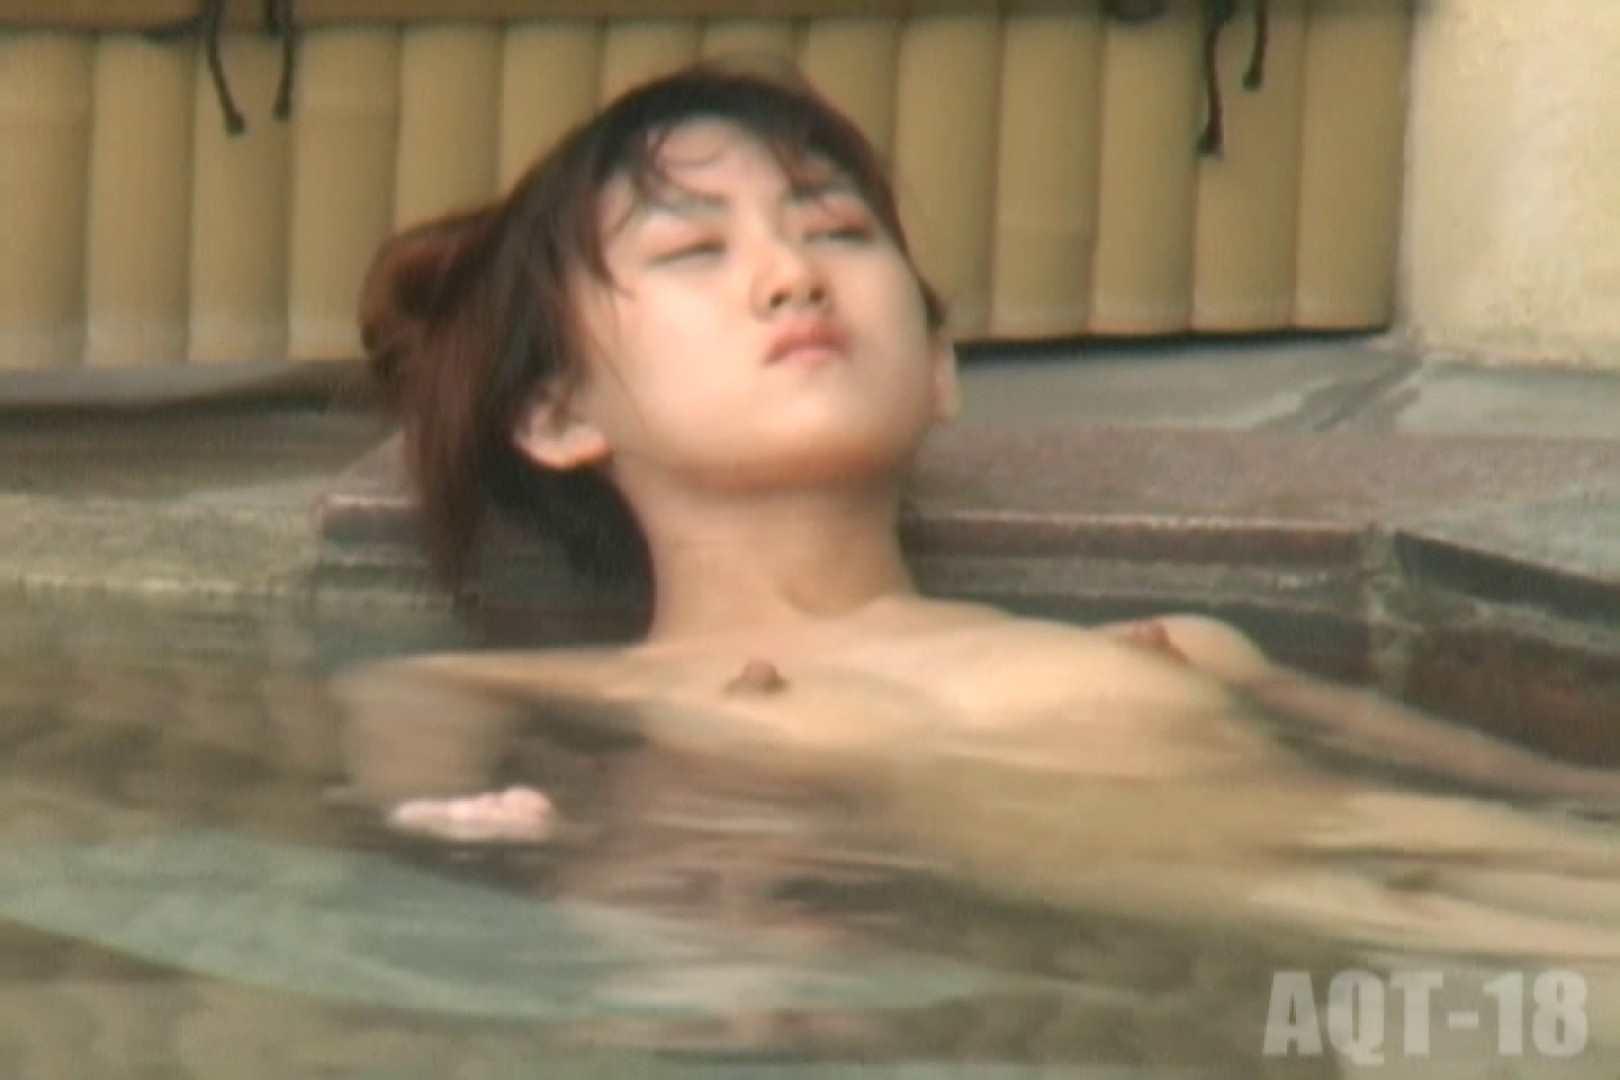 Aquaな露天風呂Vol.862 美しいOLの裸体 戯れ無修正画像 99pic 32